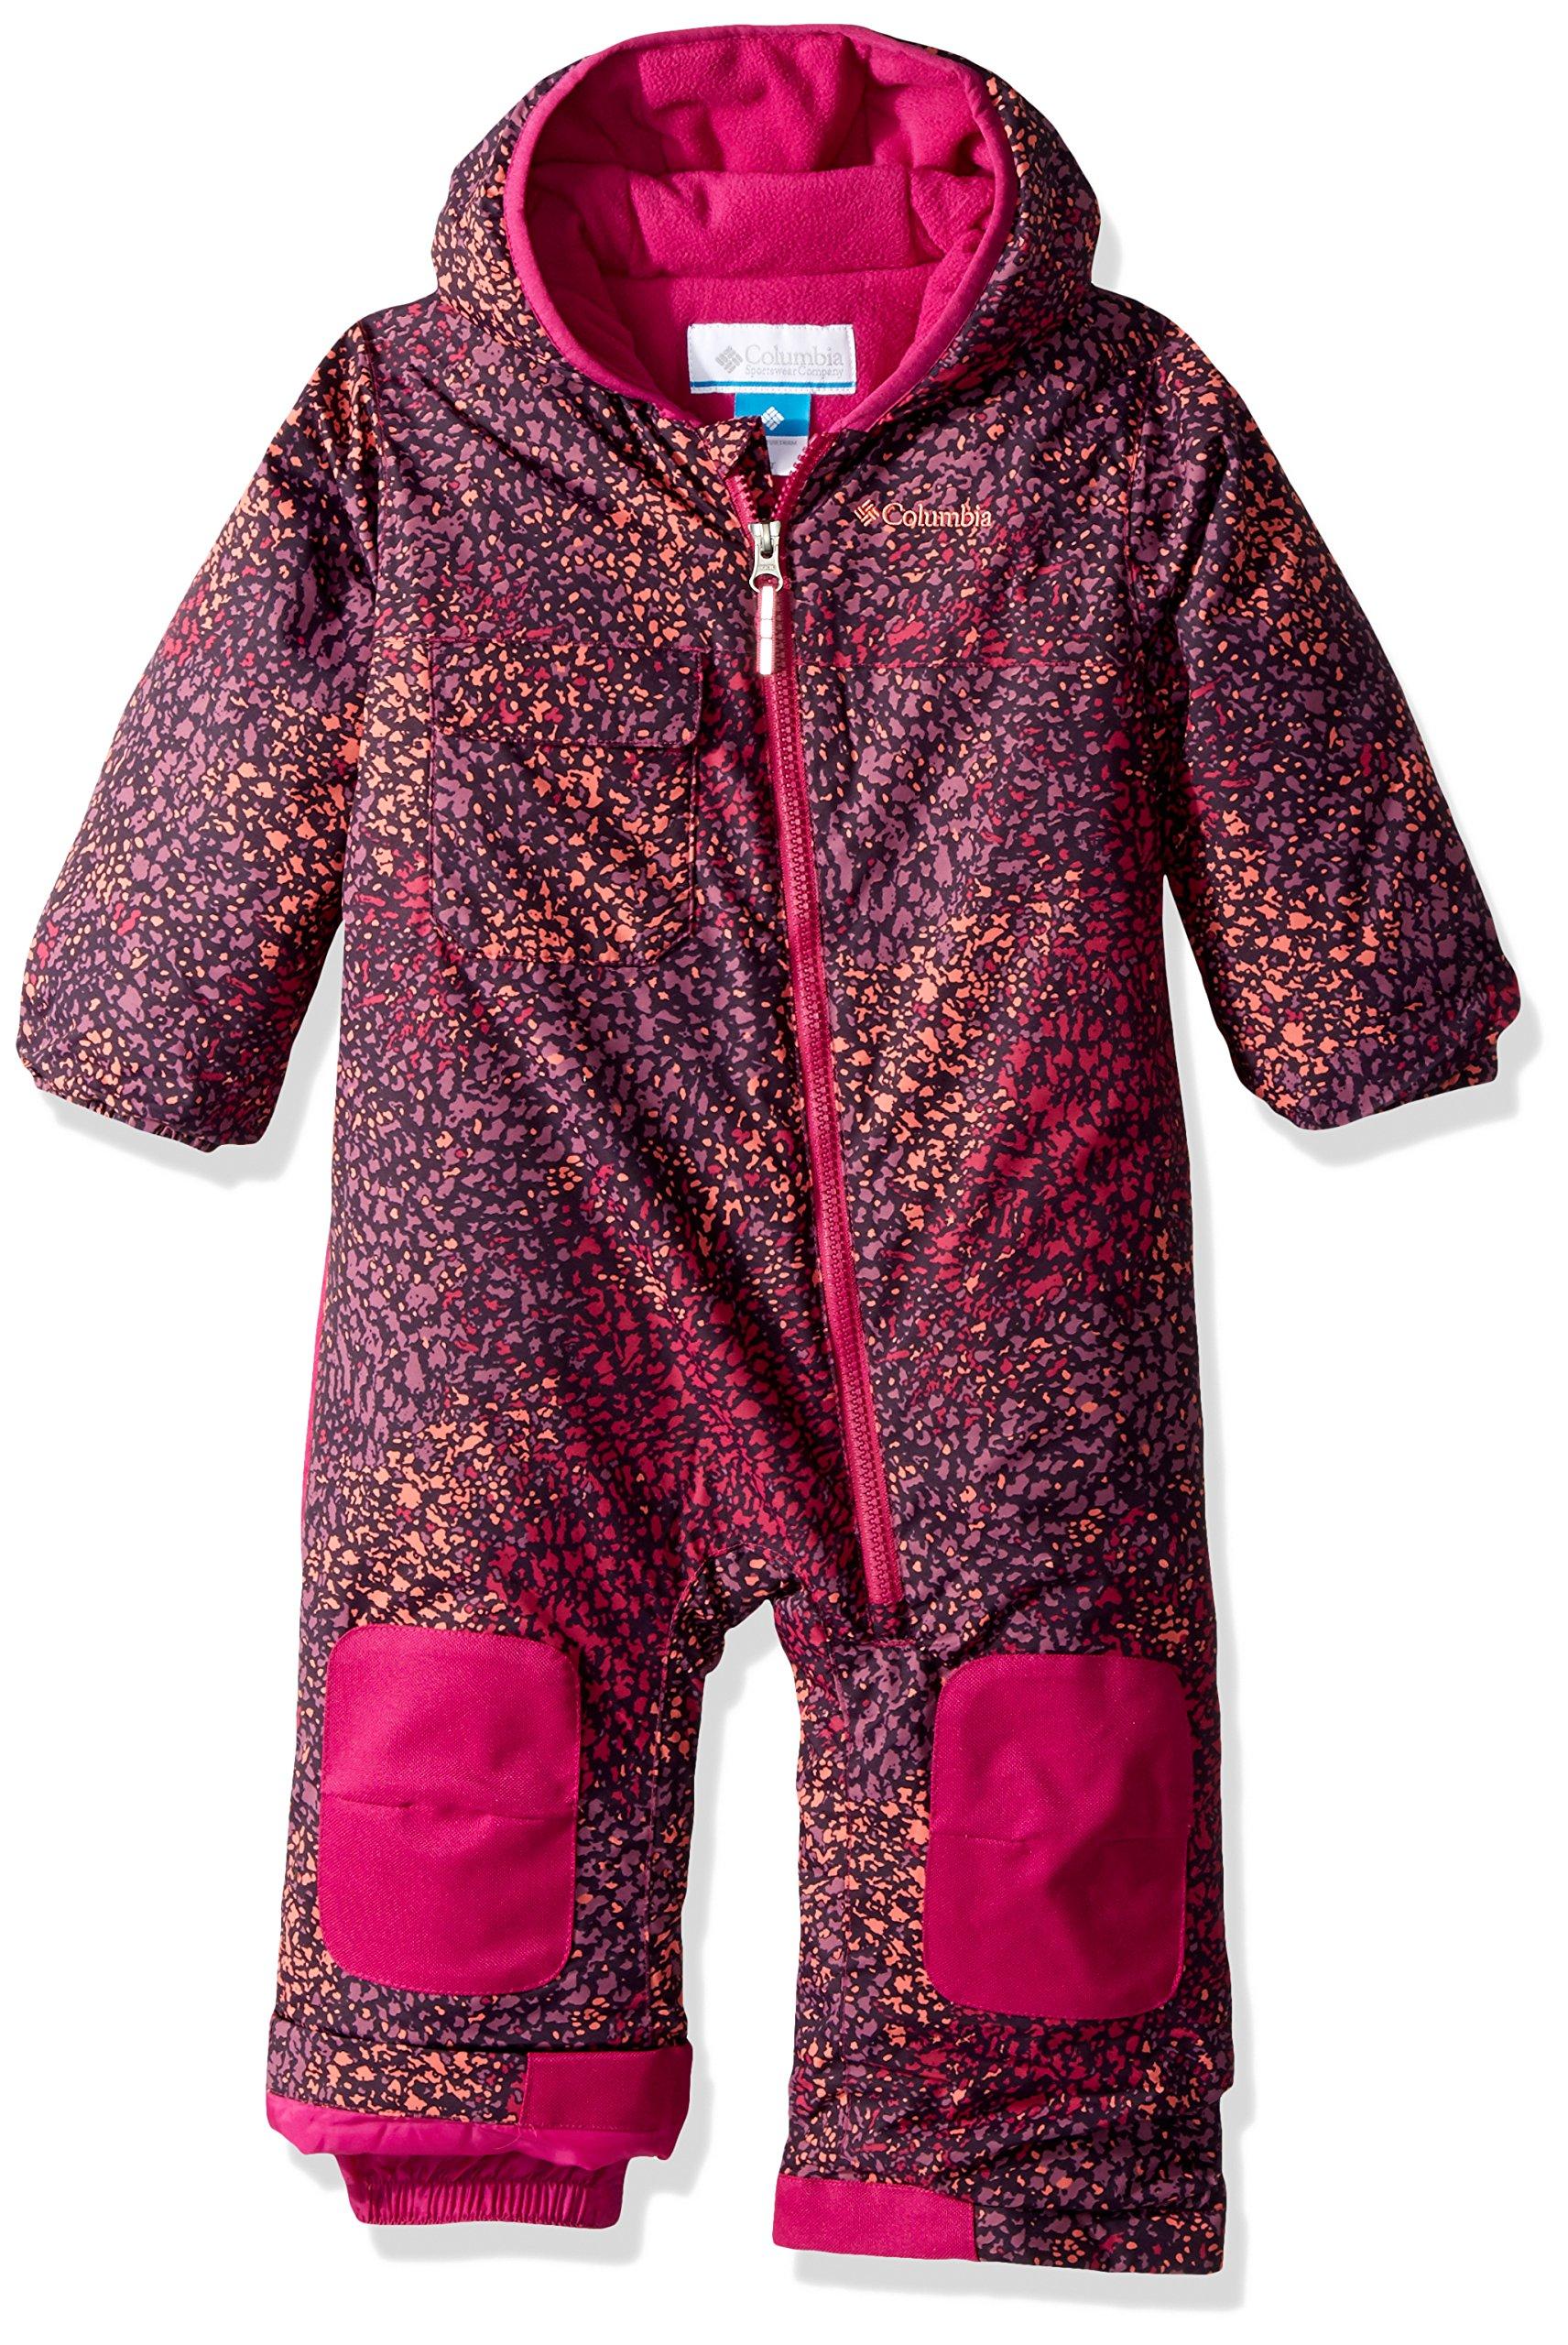 Columbia Toddler Boys' Hot-Tot Suit, Deep Blush Snow Splatter, 3T